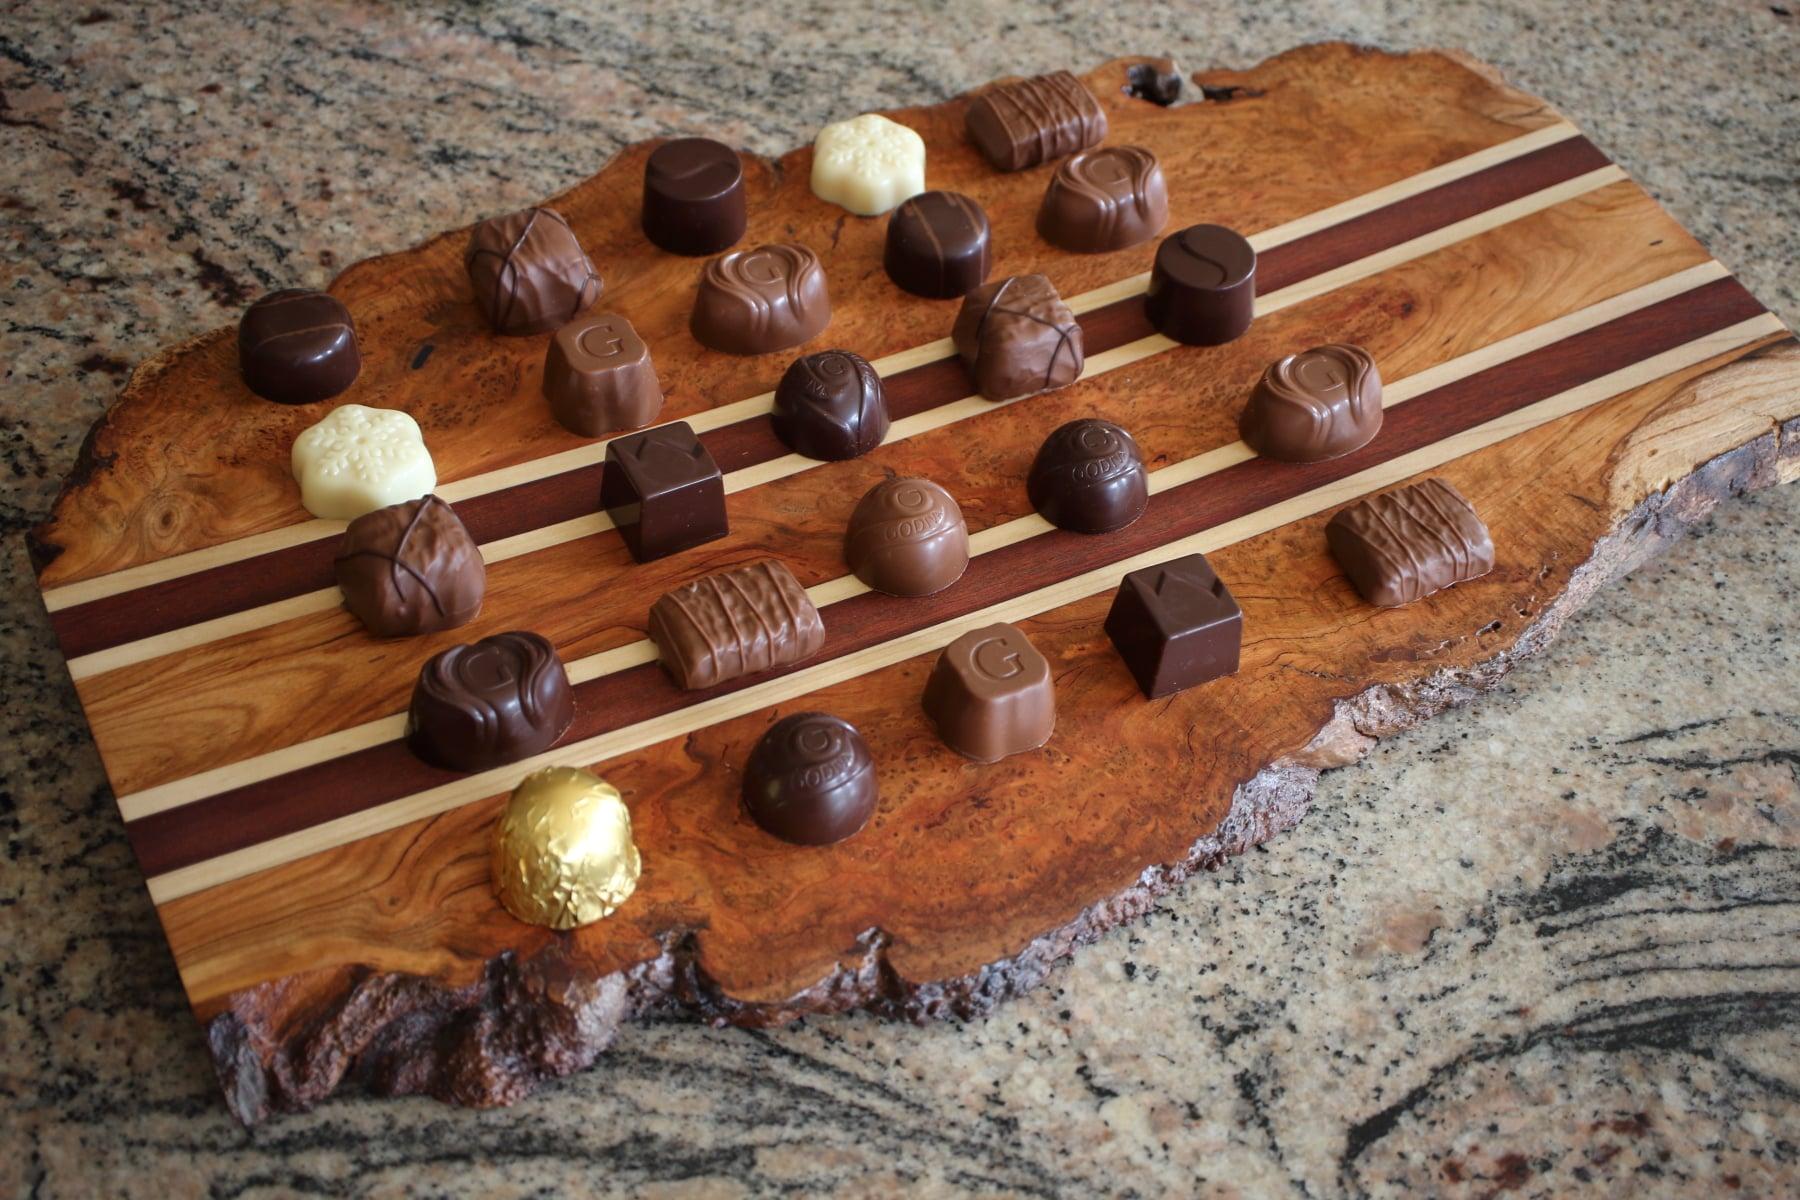 Cutting board with chocolates